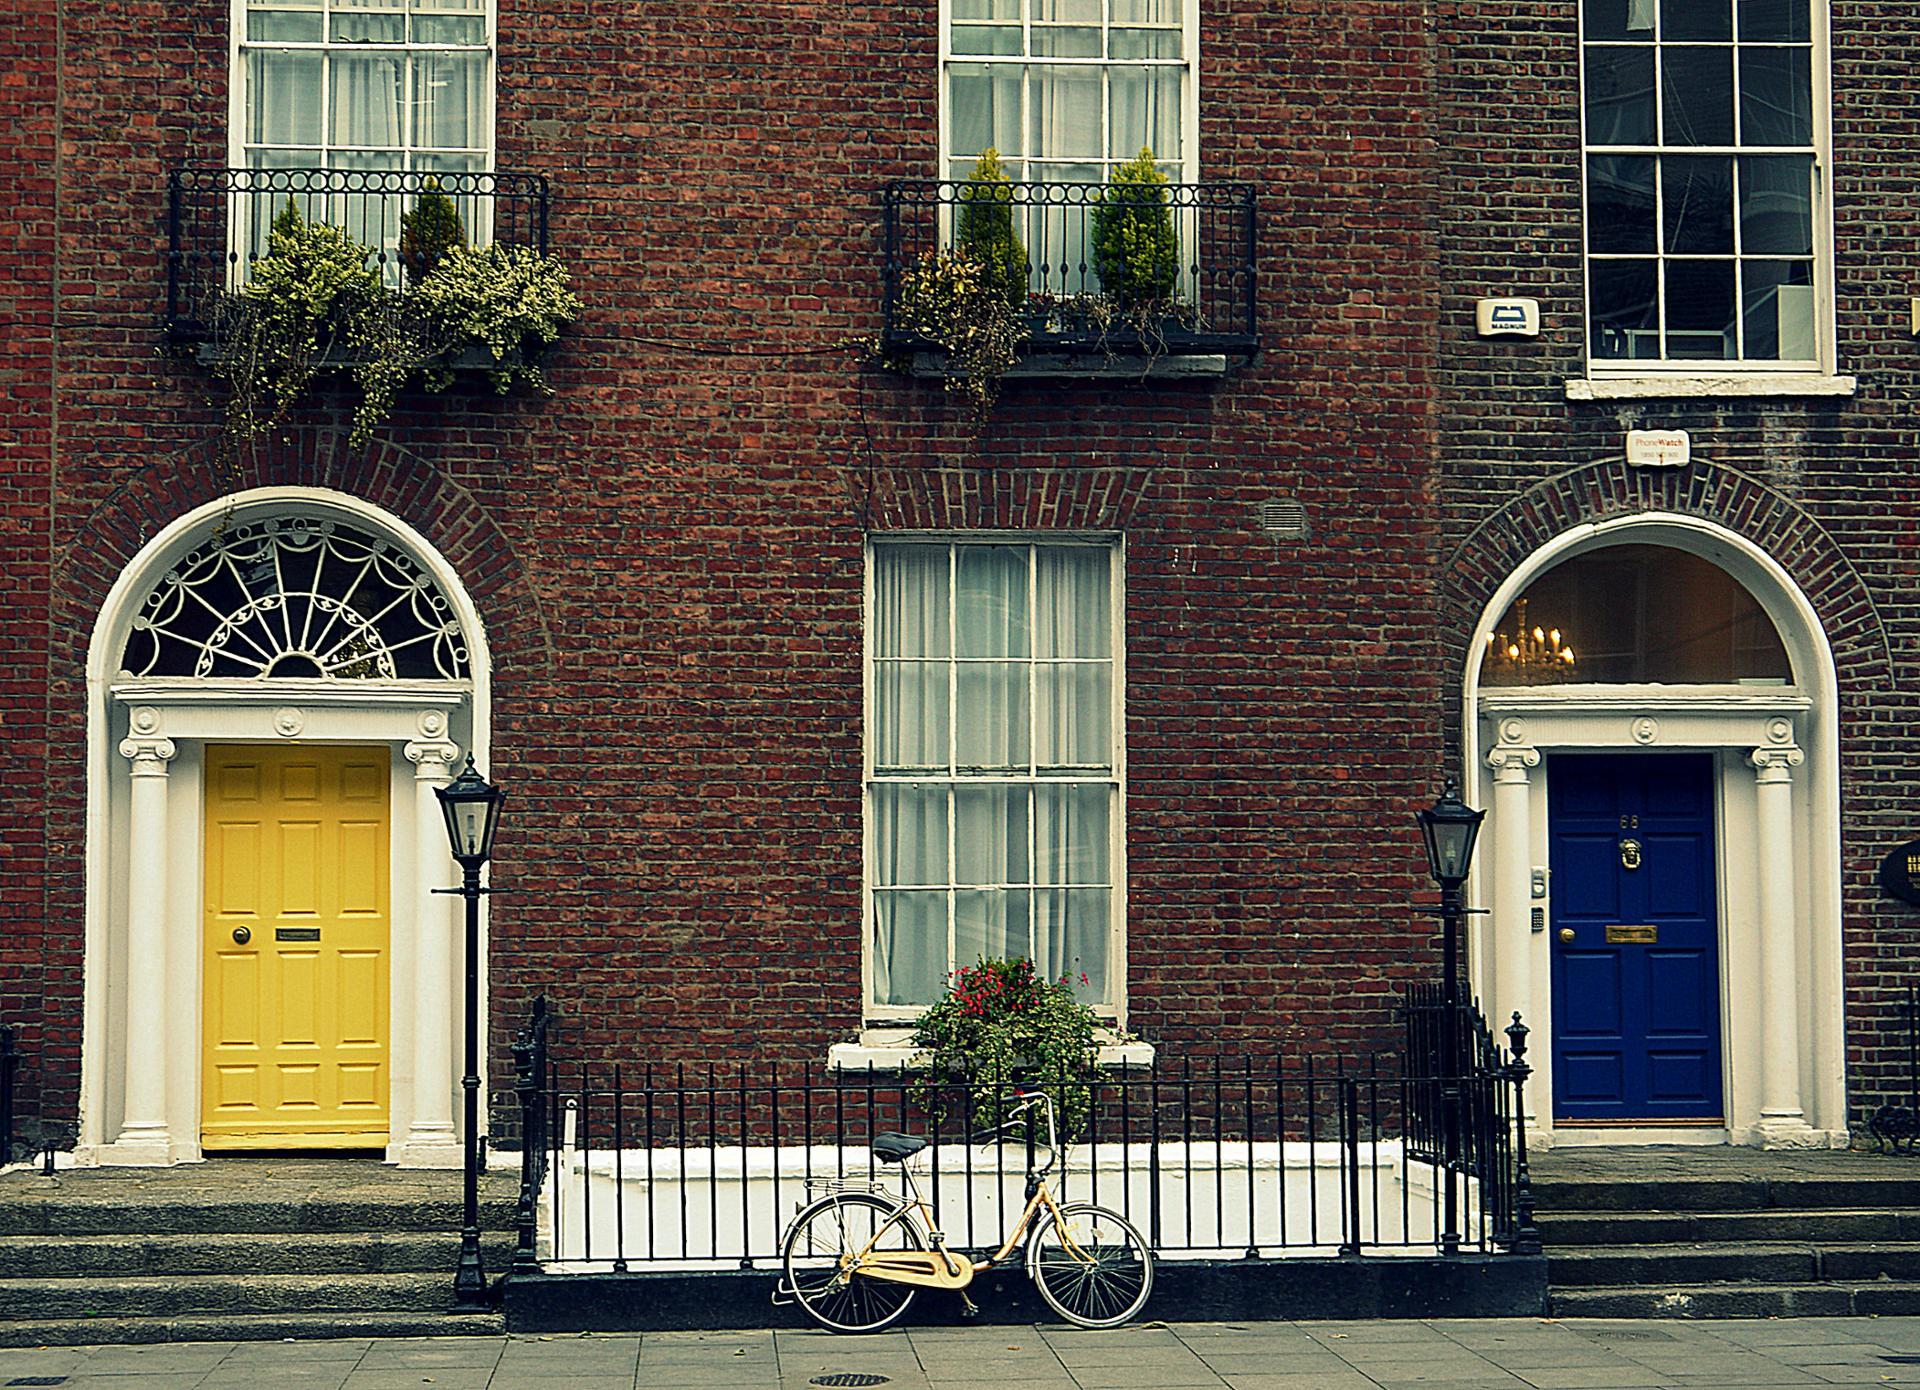 Bienvenue à Dublin